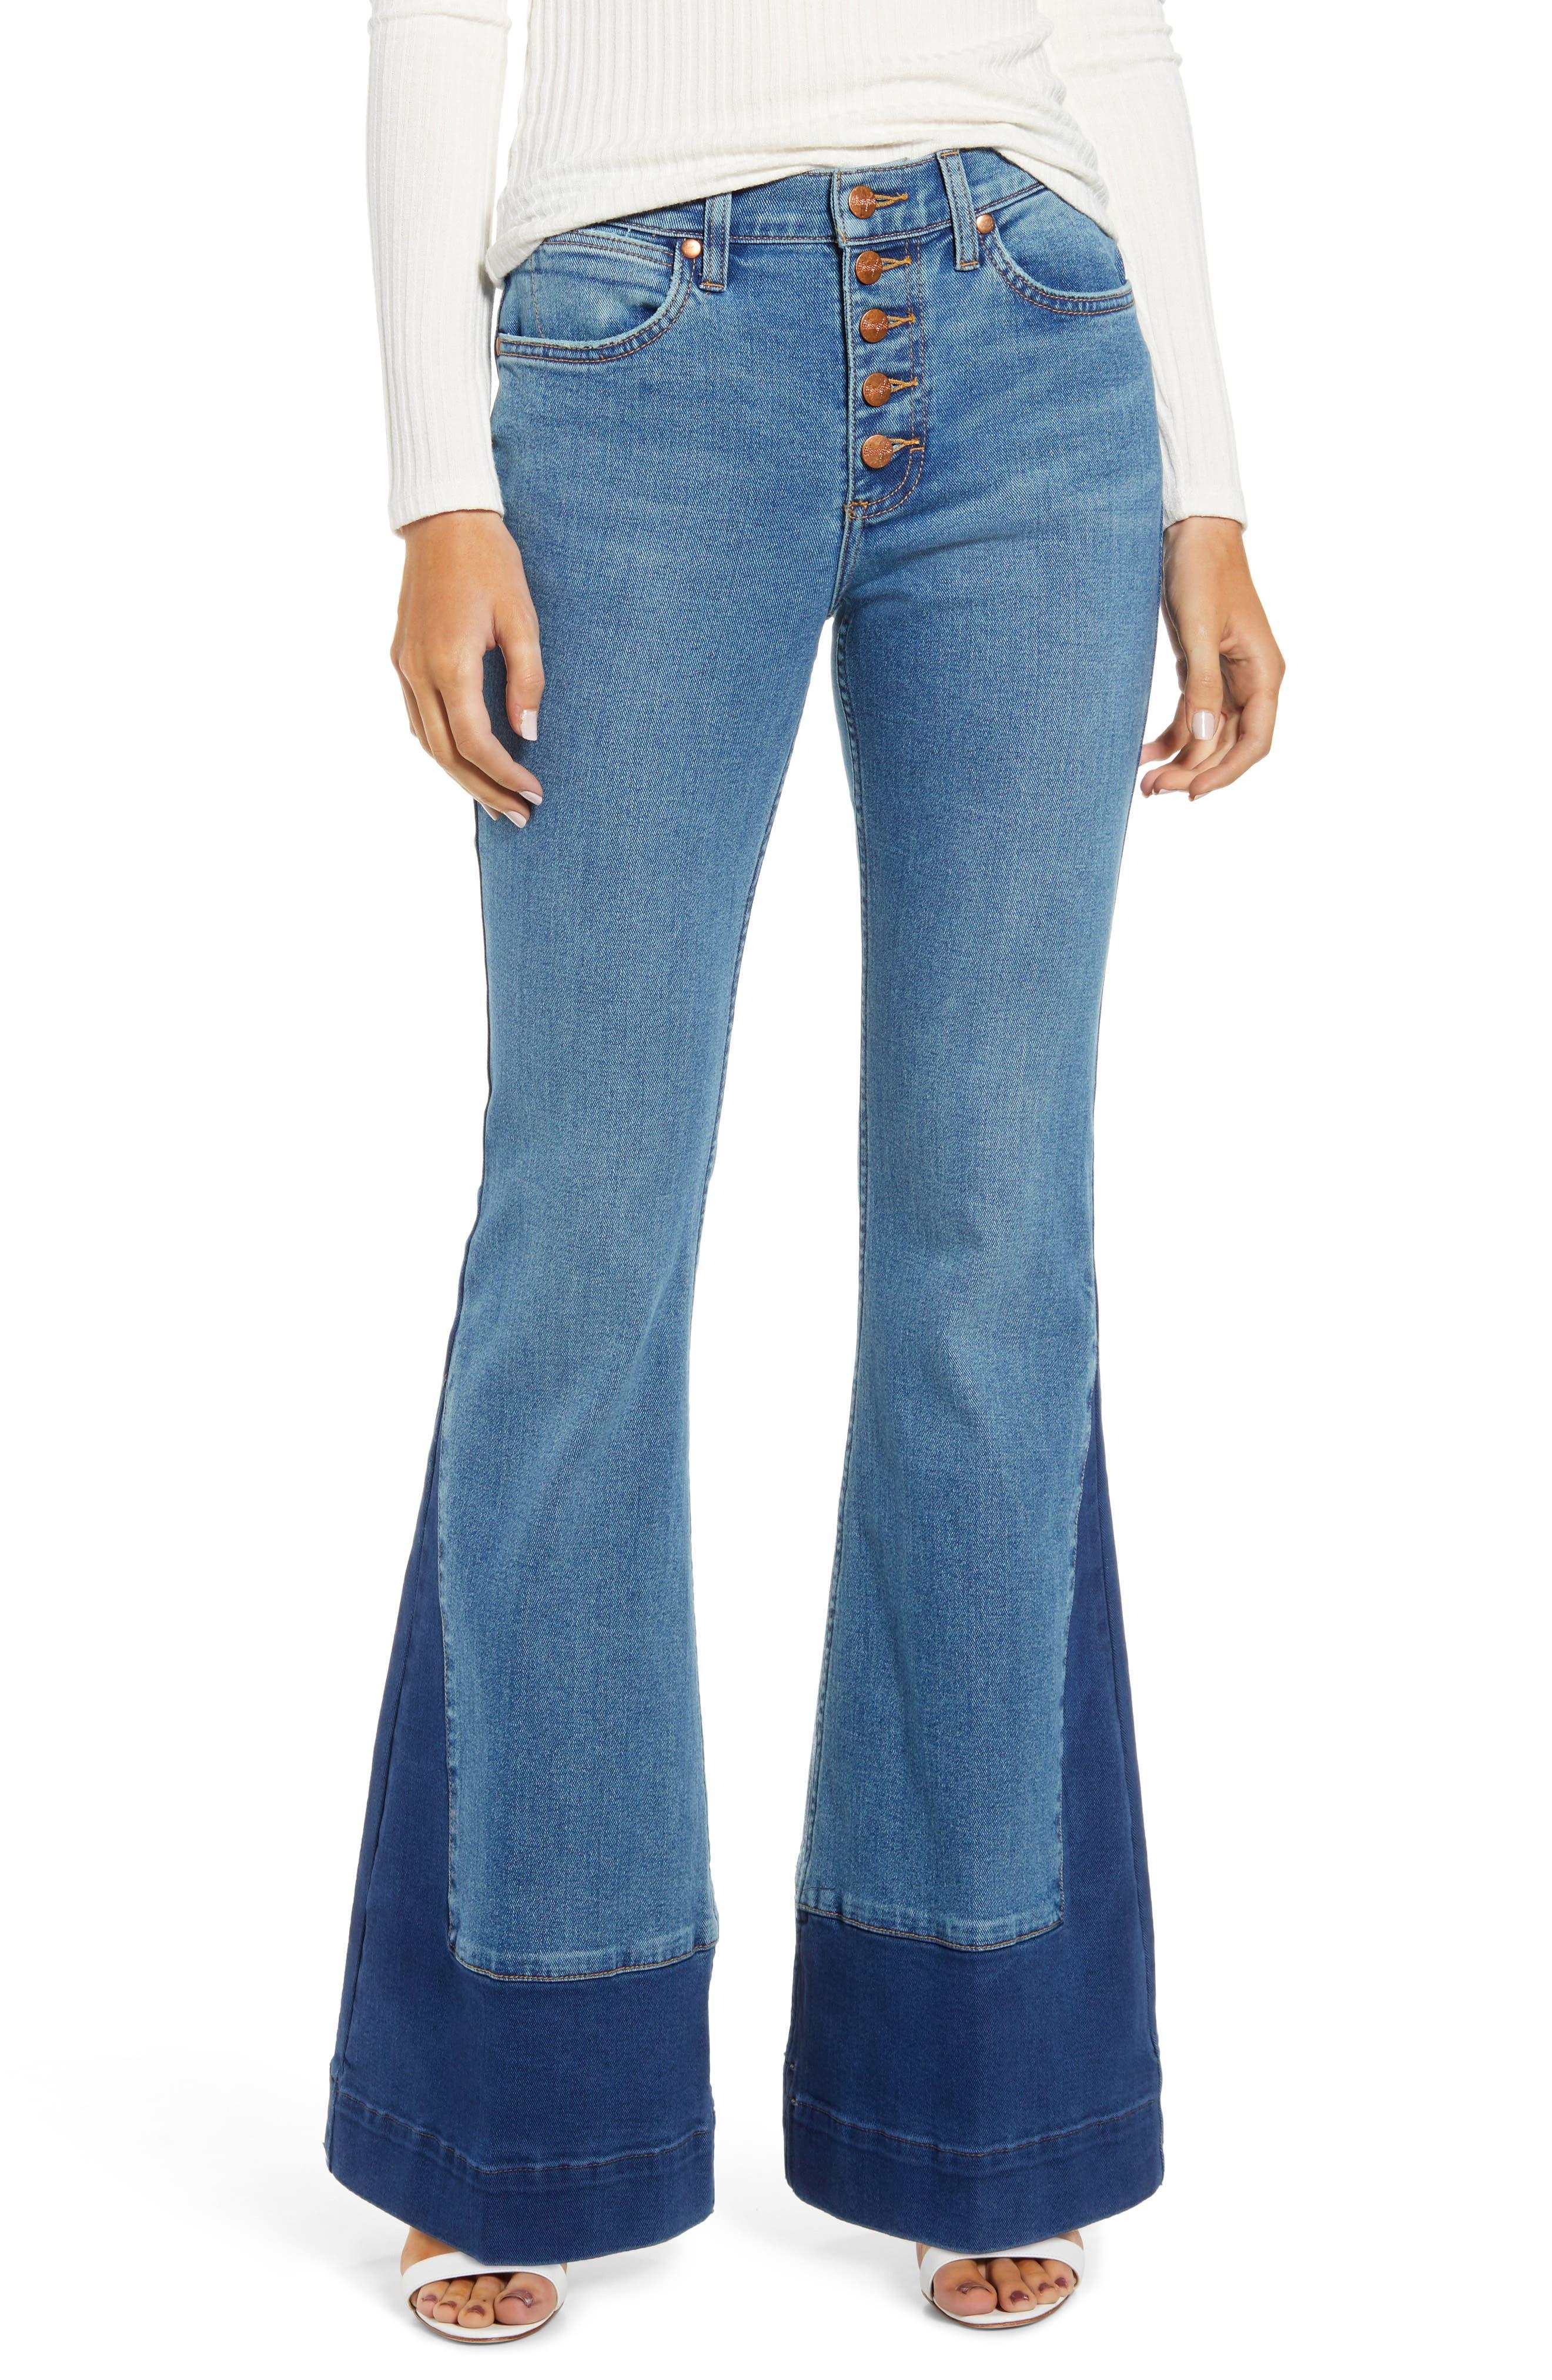 Wrangler Contrast Hem High Waist Flare Jeans (Topaz)